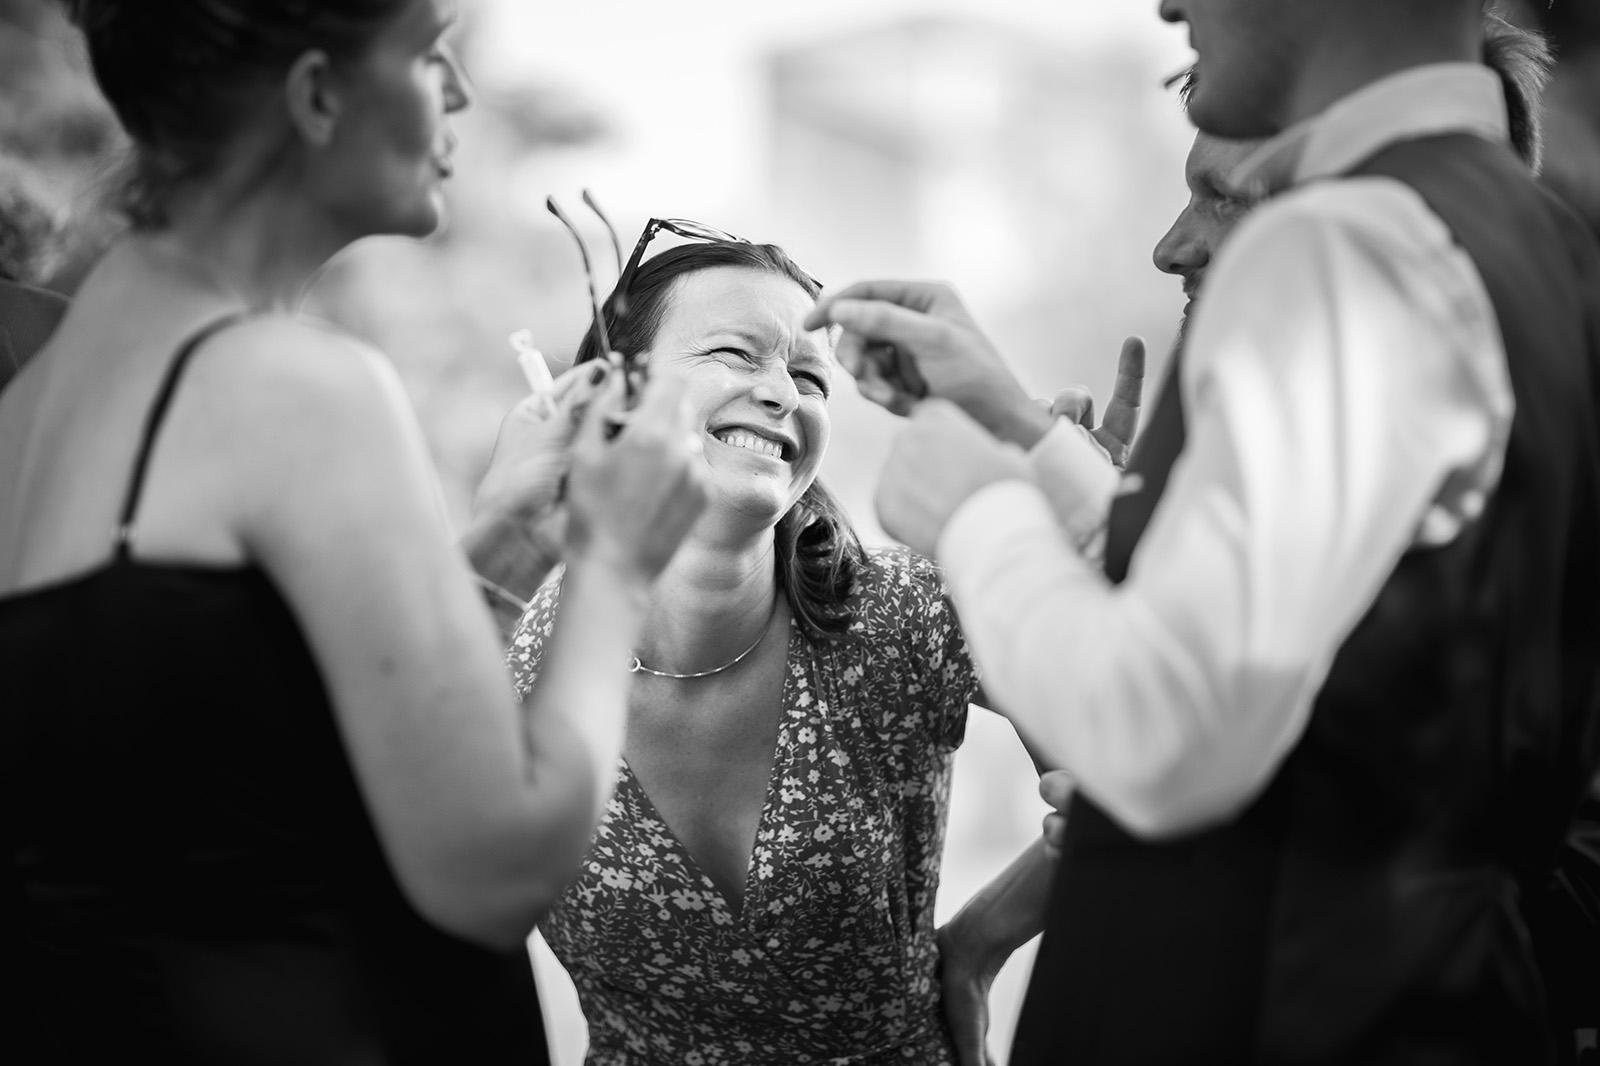 photographe-mariage-reportage-wedding-photographer-ceremonie-anse-domaine-de-benevent-beaujolais-elise-julliard-lyon-auvergne-rhone-alpes-5